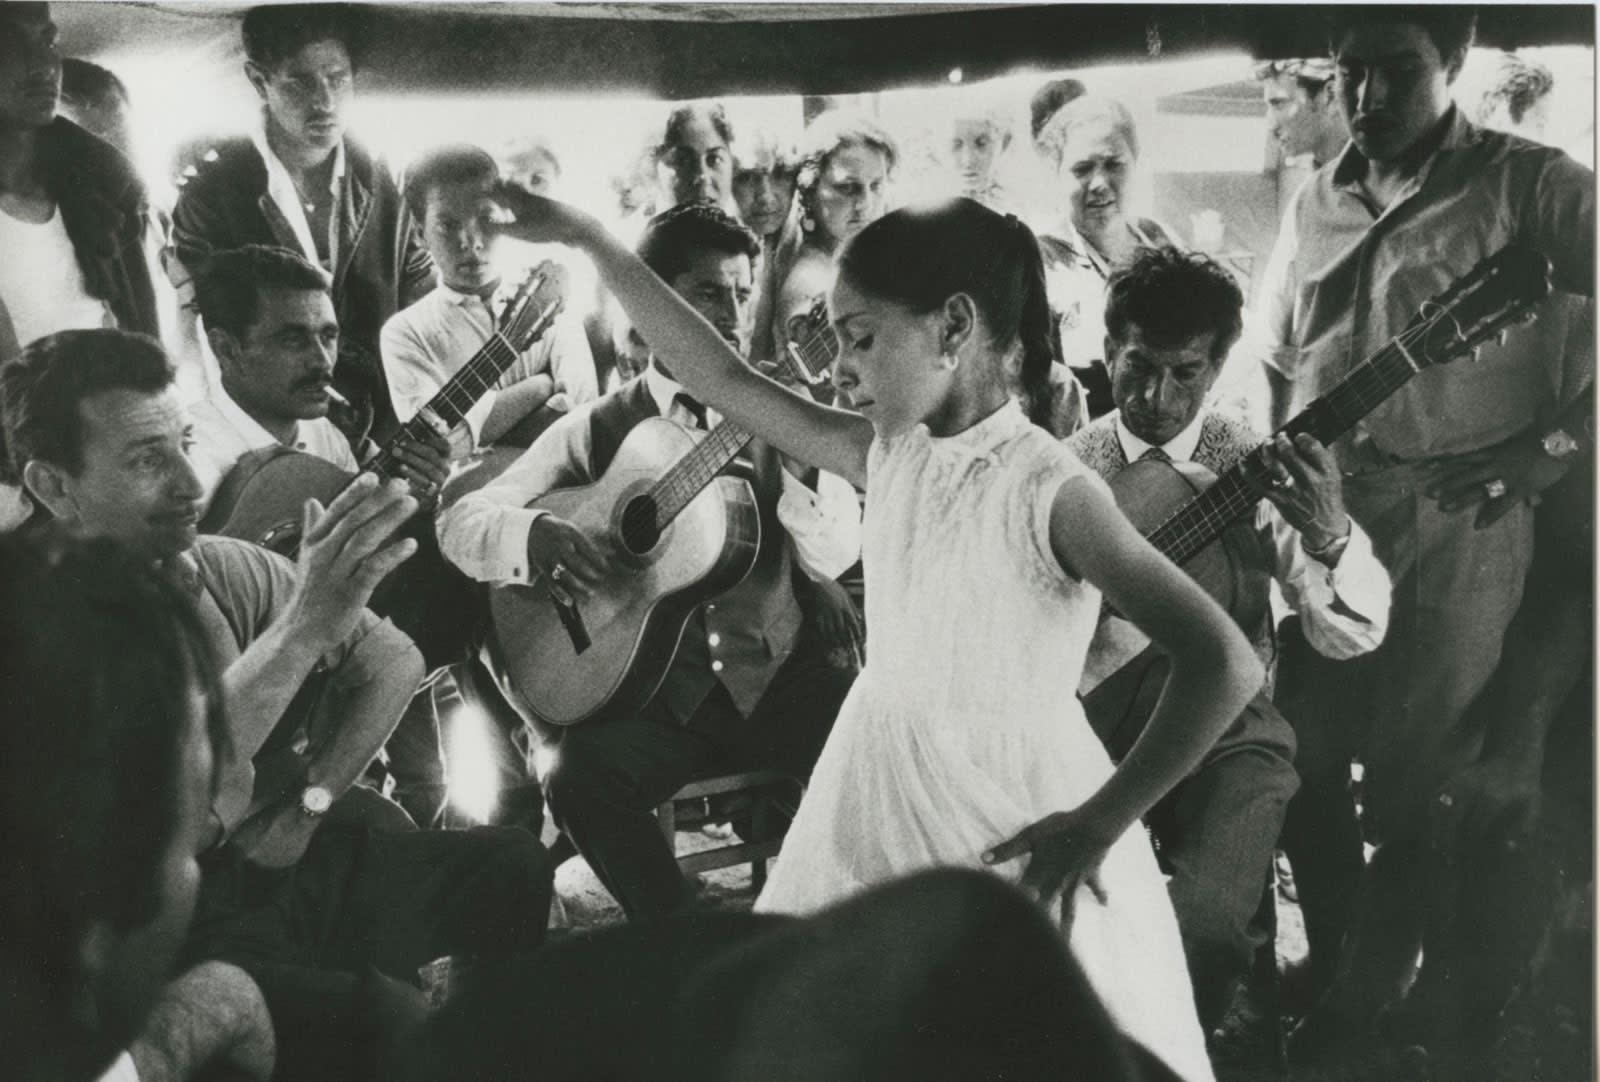 Sabine Weiss, Petite gitane et Manitas de Plata, Saintes-Maries-de-la-Mer, 1960